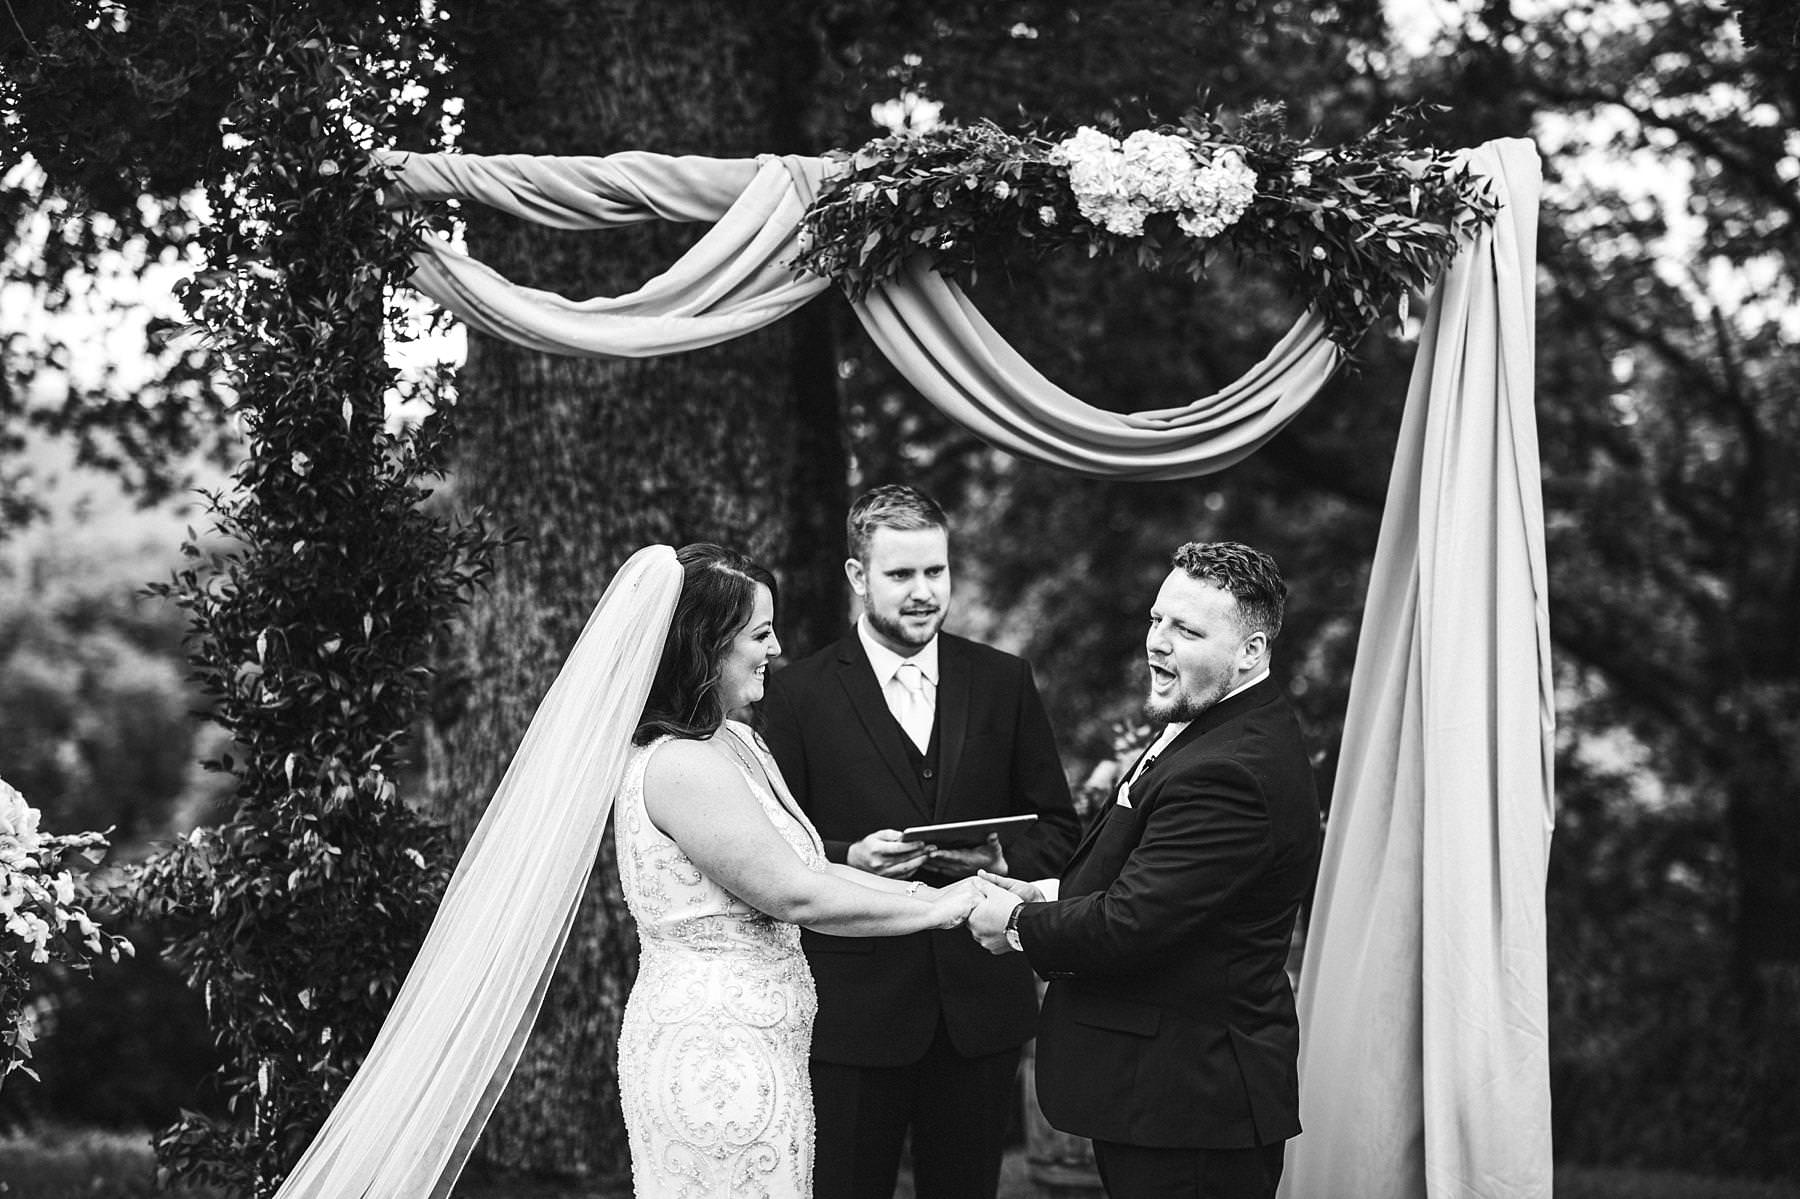 Lovely and emotional symbolic outdoor wedding ceremony at farmhouse Villa Le Bolli venue near Radicondoli